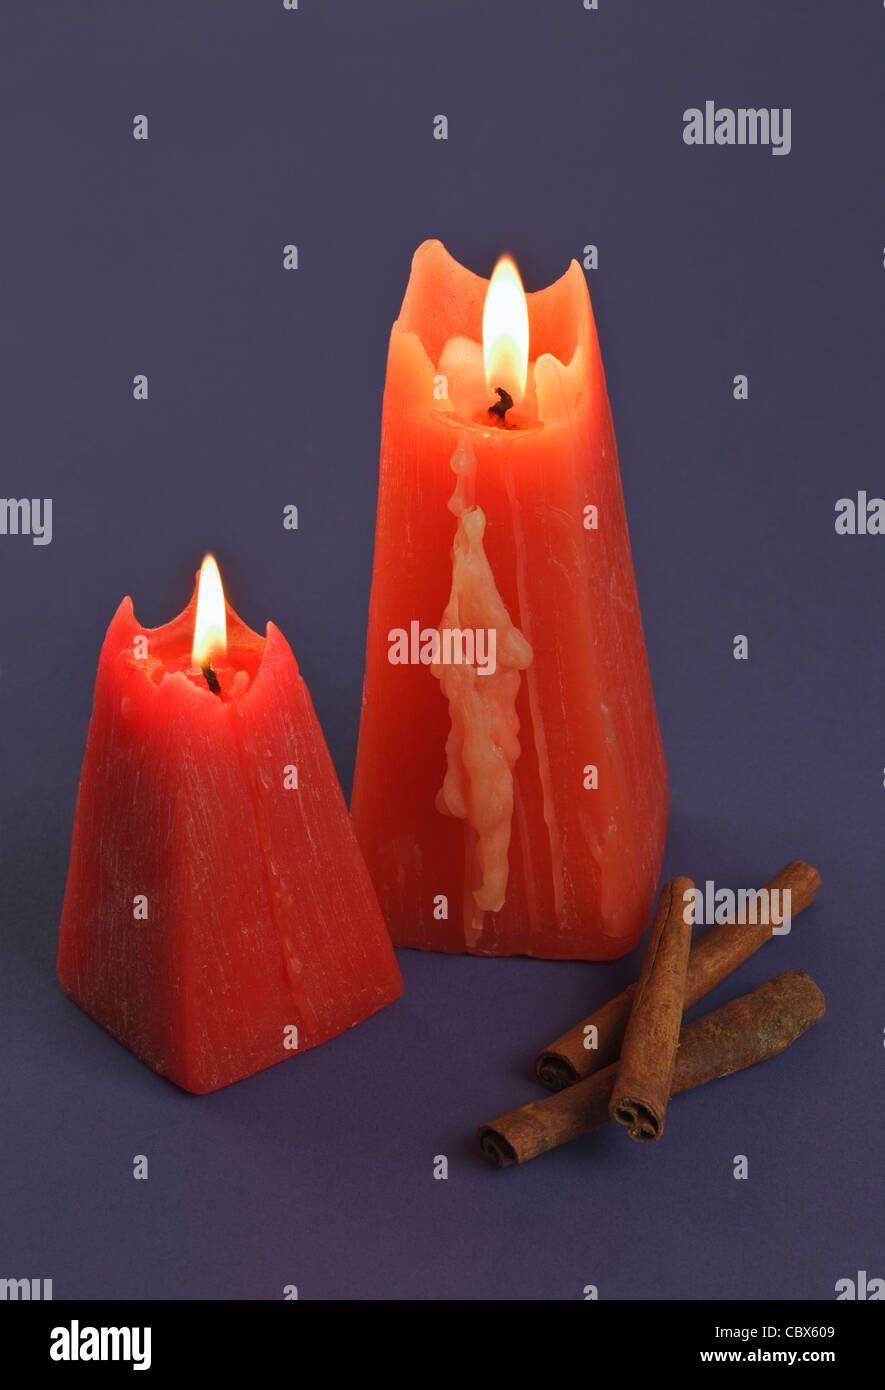 Dos quemando velas rojas con palitos de canela Imagen De Stock